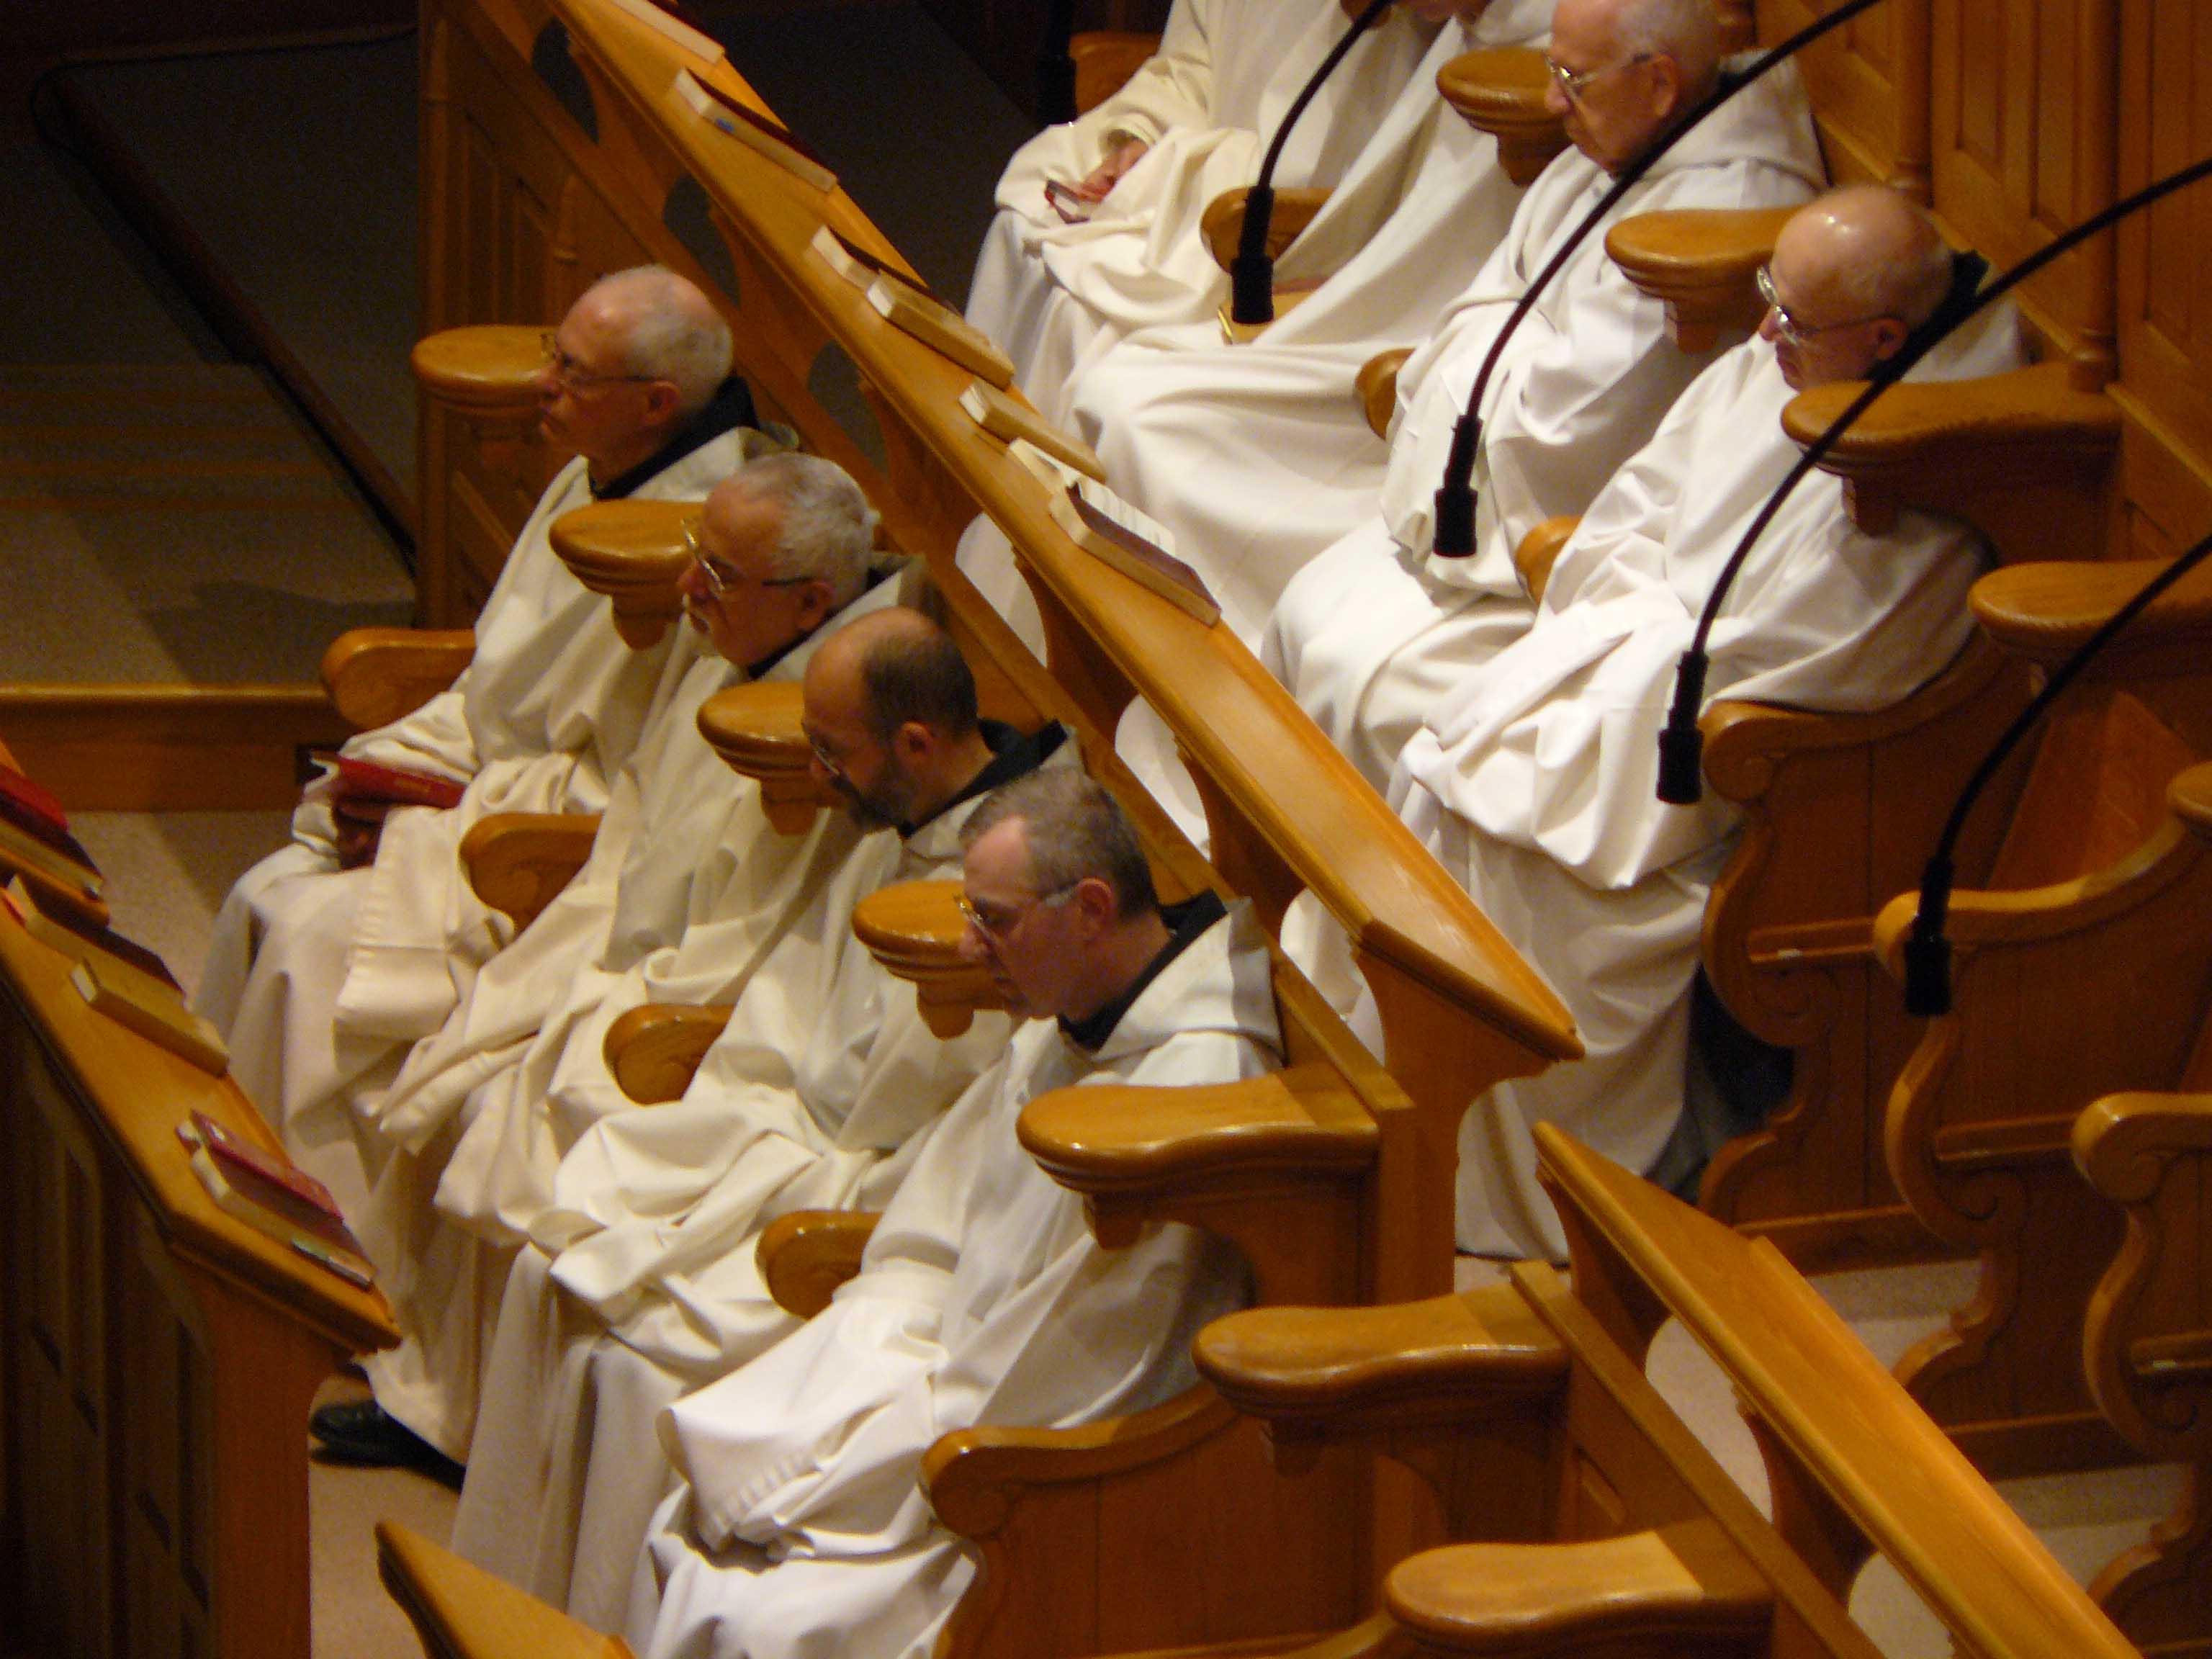 L'héritage des Trappistes d'Oka, un film de Ninon Larochelle